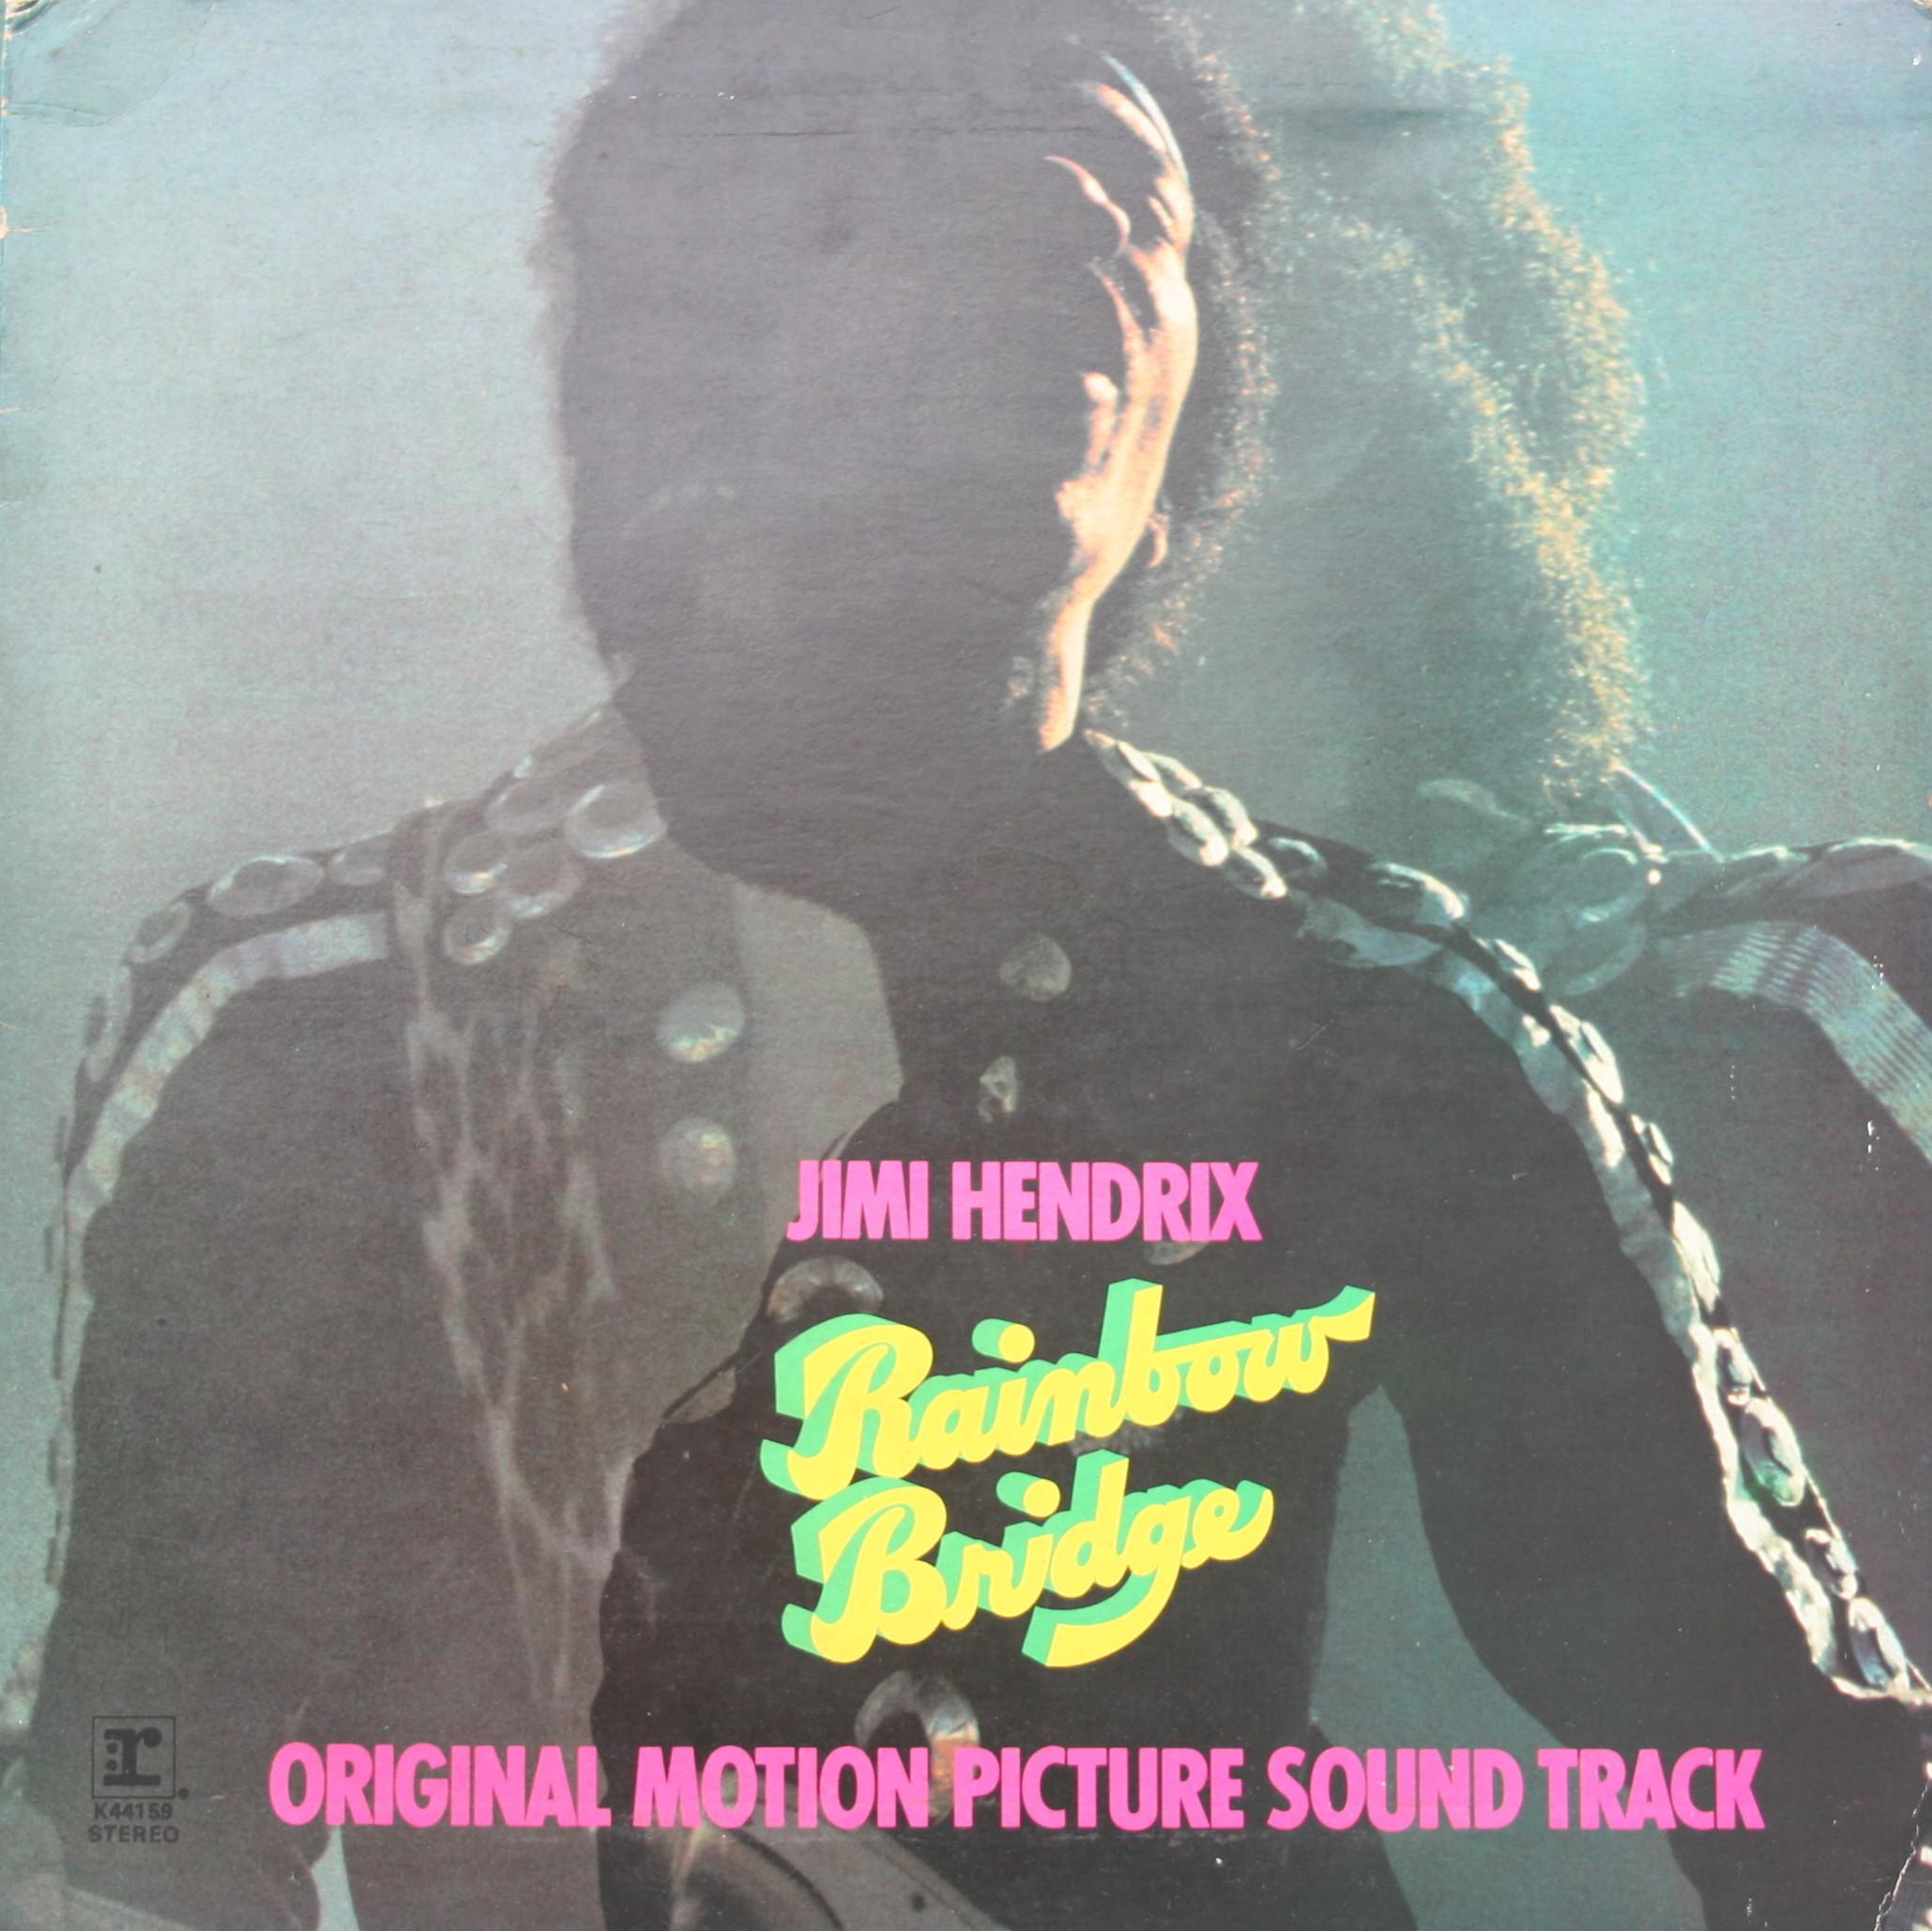 The First Album of Jimi Hendrix